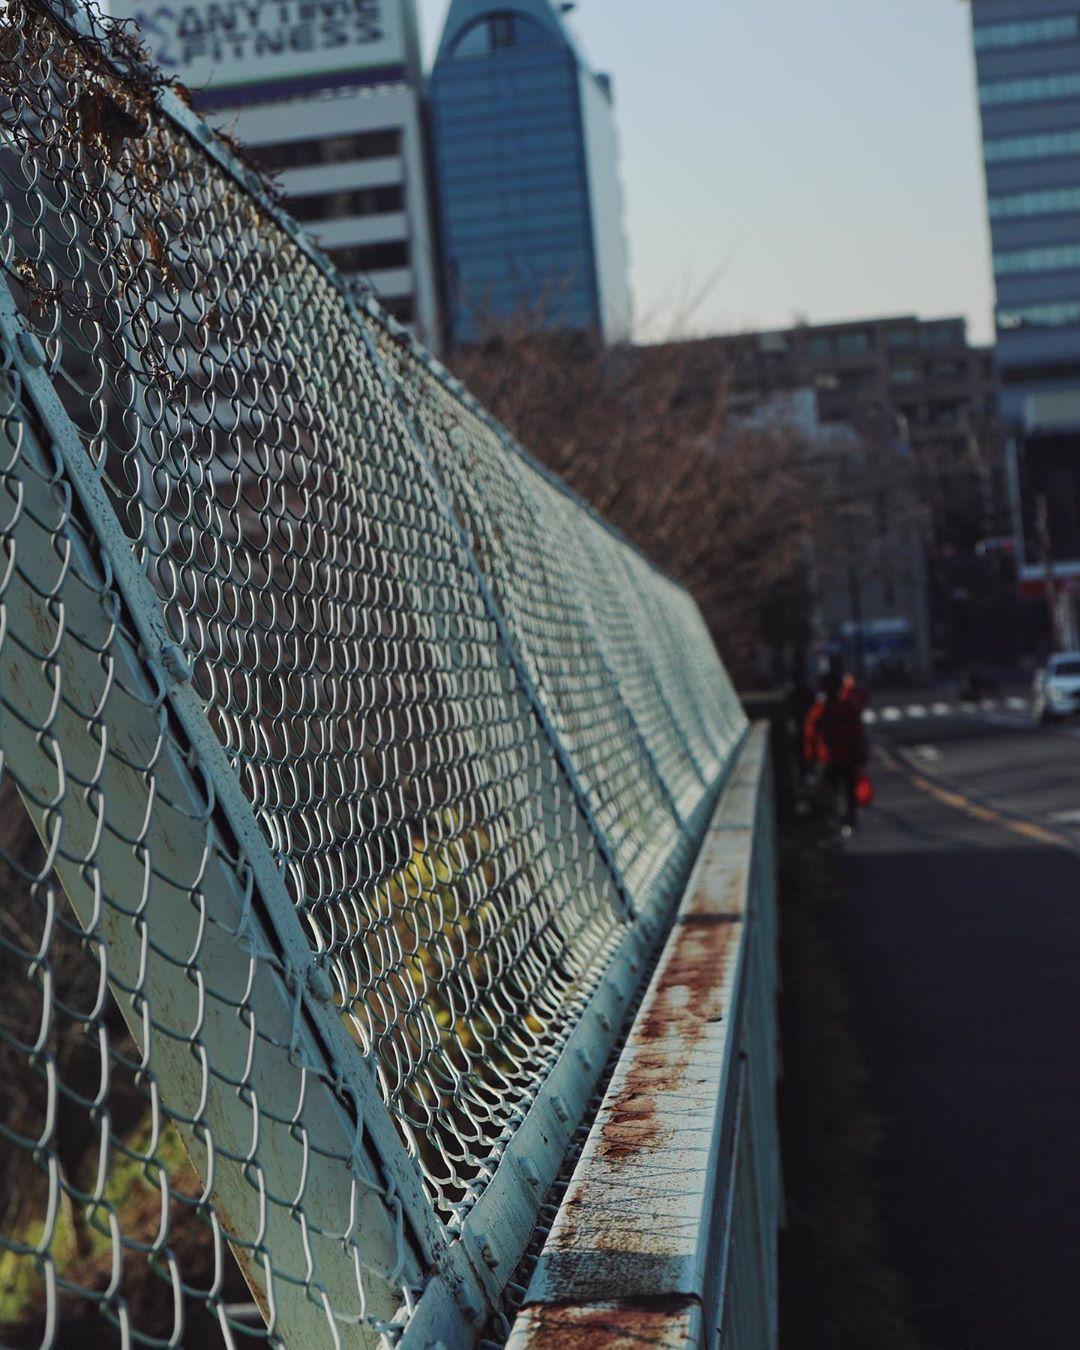 Rusted wire fence / 市ヶ谷 --- Canon_Eos KISS M Lens: EF-M 32mm F1.4 --- #vsco #vscogram #dailysnaps #my_eos_photo #eoskissm #efm32mmf14stm #eosm #streetsnaps #tokyocameraclub #tokyostreet #市ヶ谷 #東京カメラ部 #東京カメラ部instagram #東京散歩